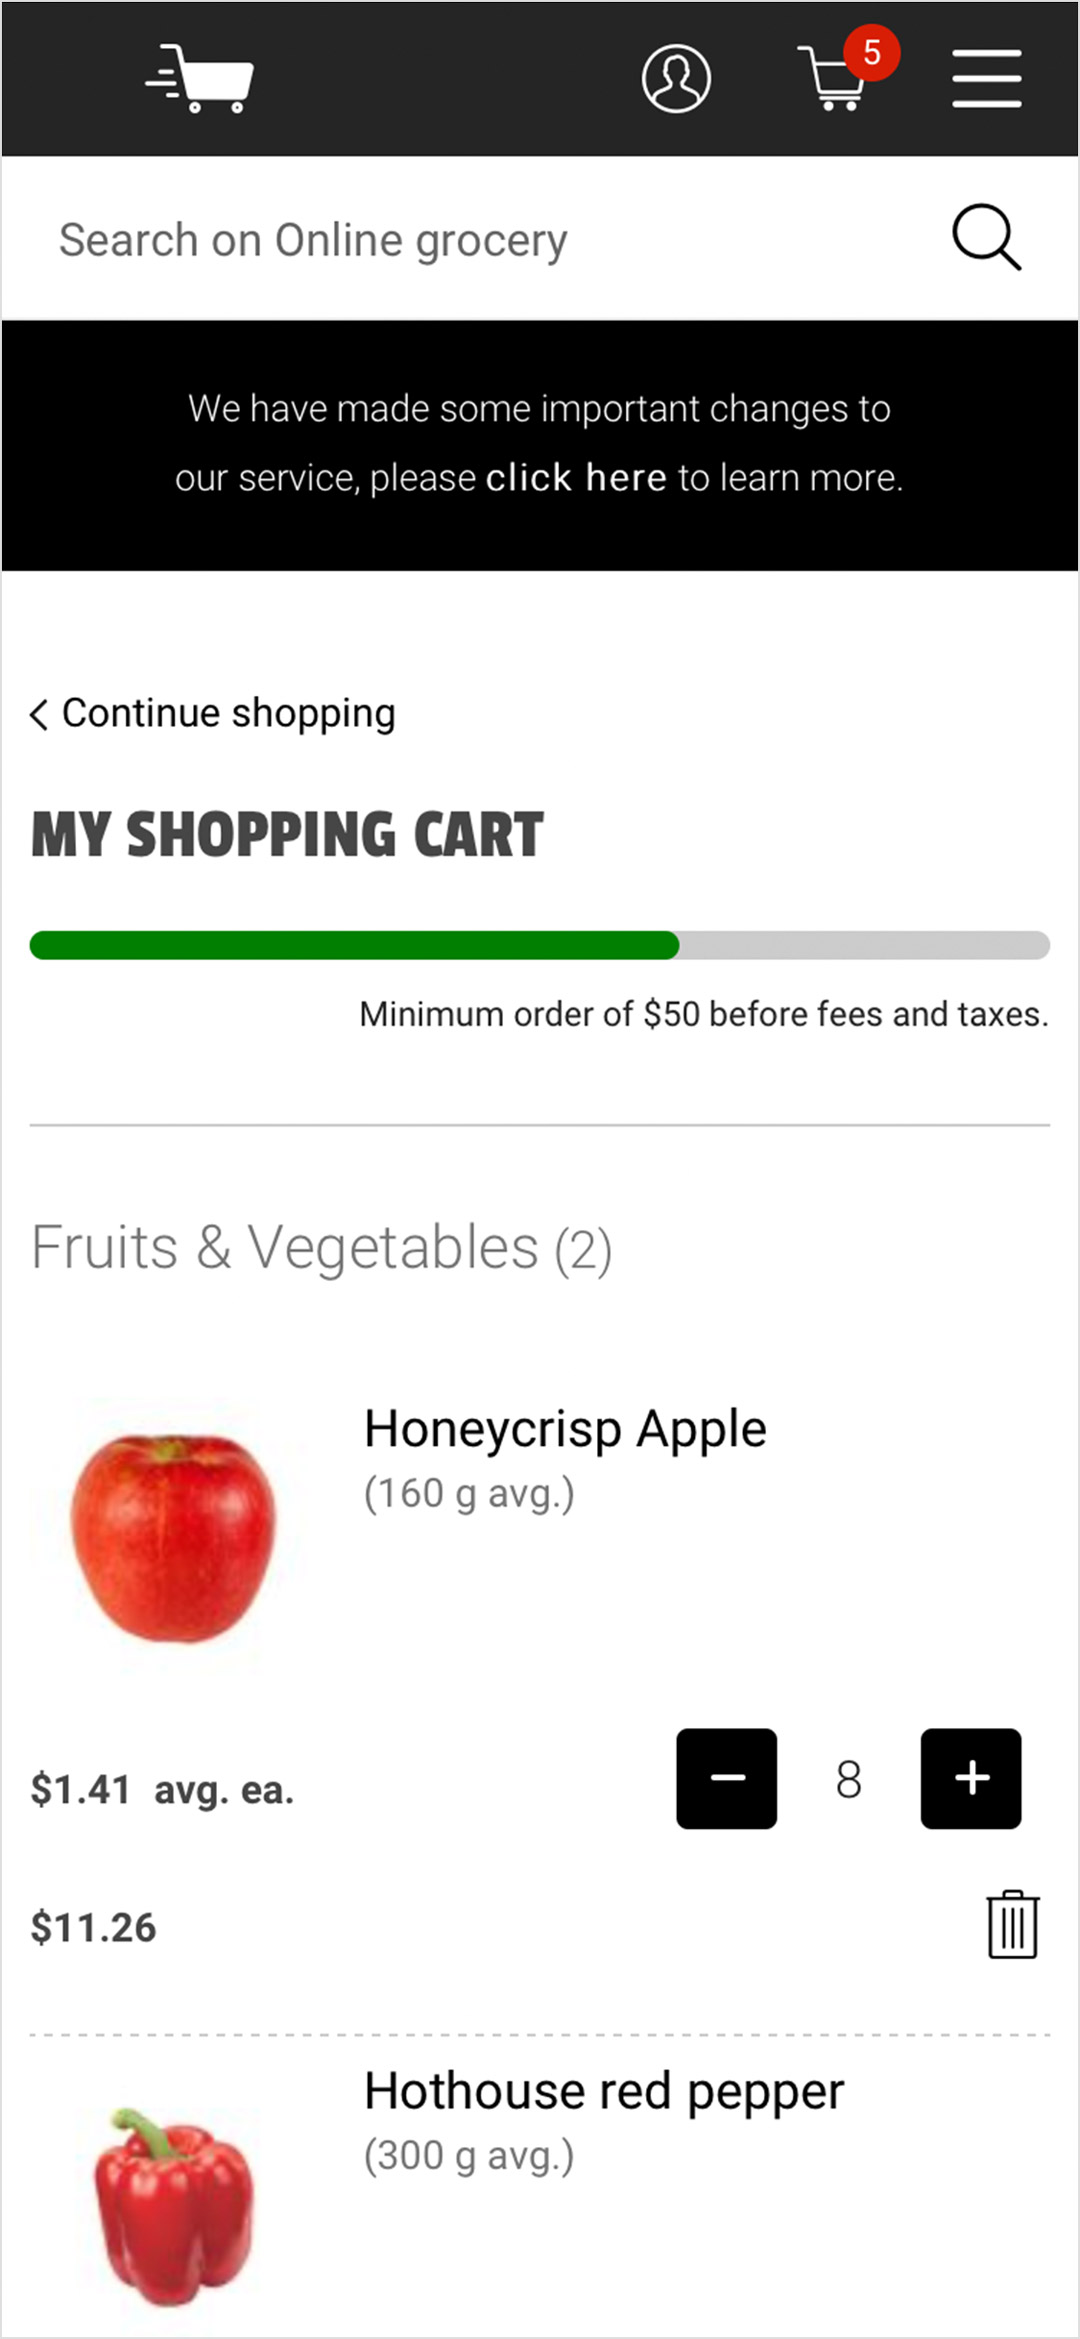 Original cart screen